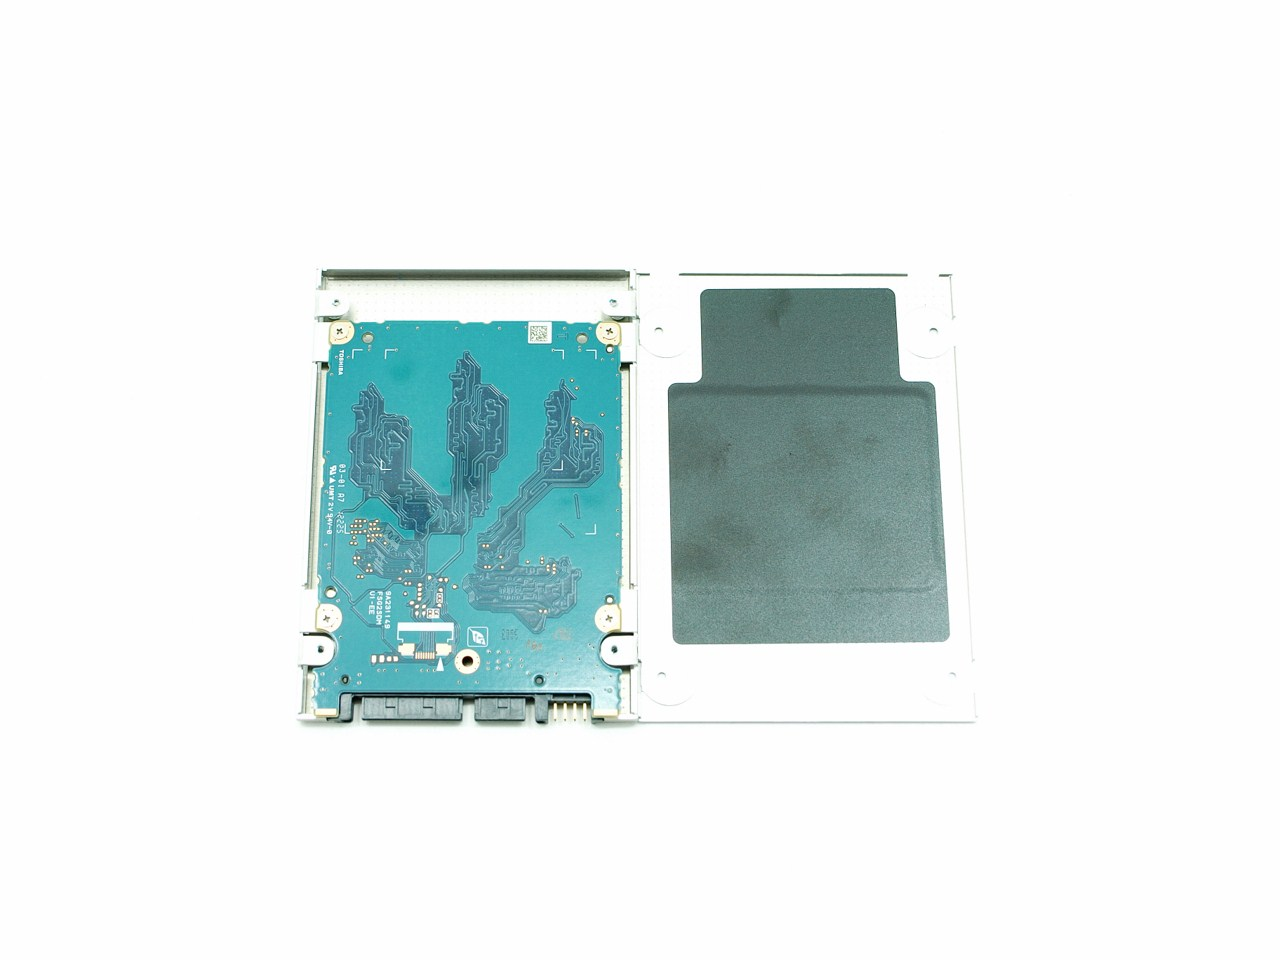 Toshiba THNSNF512GCSS 512GB SSD Review